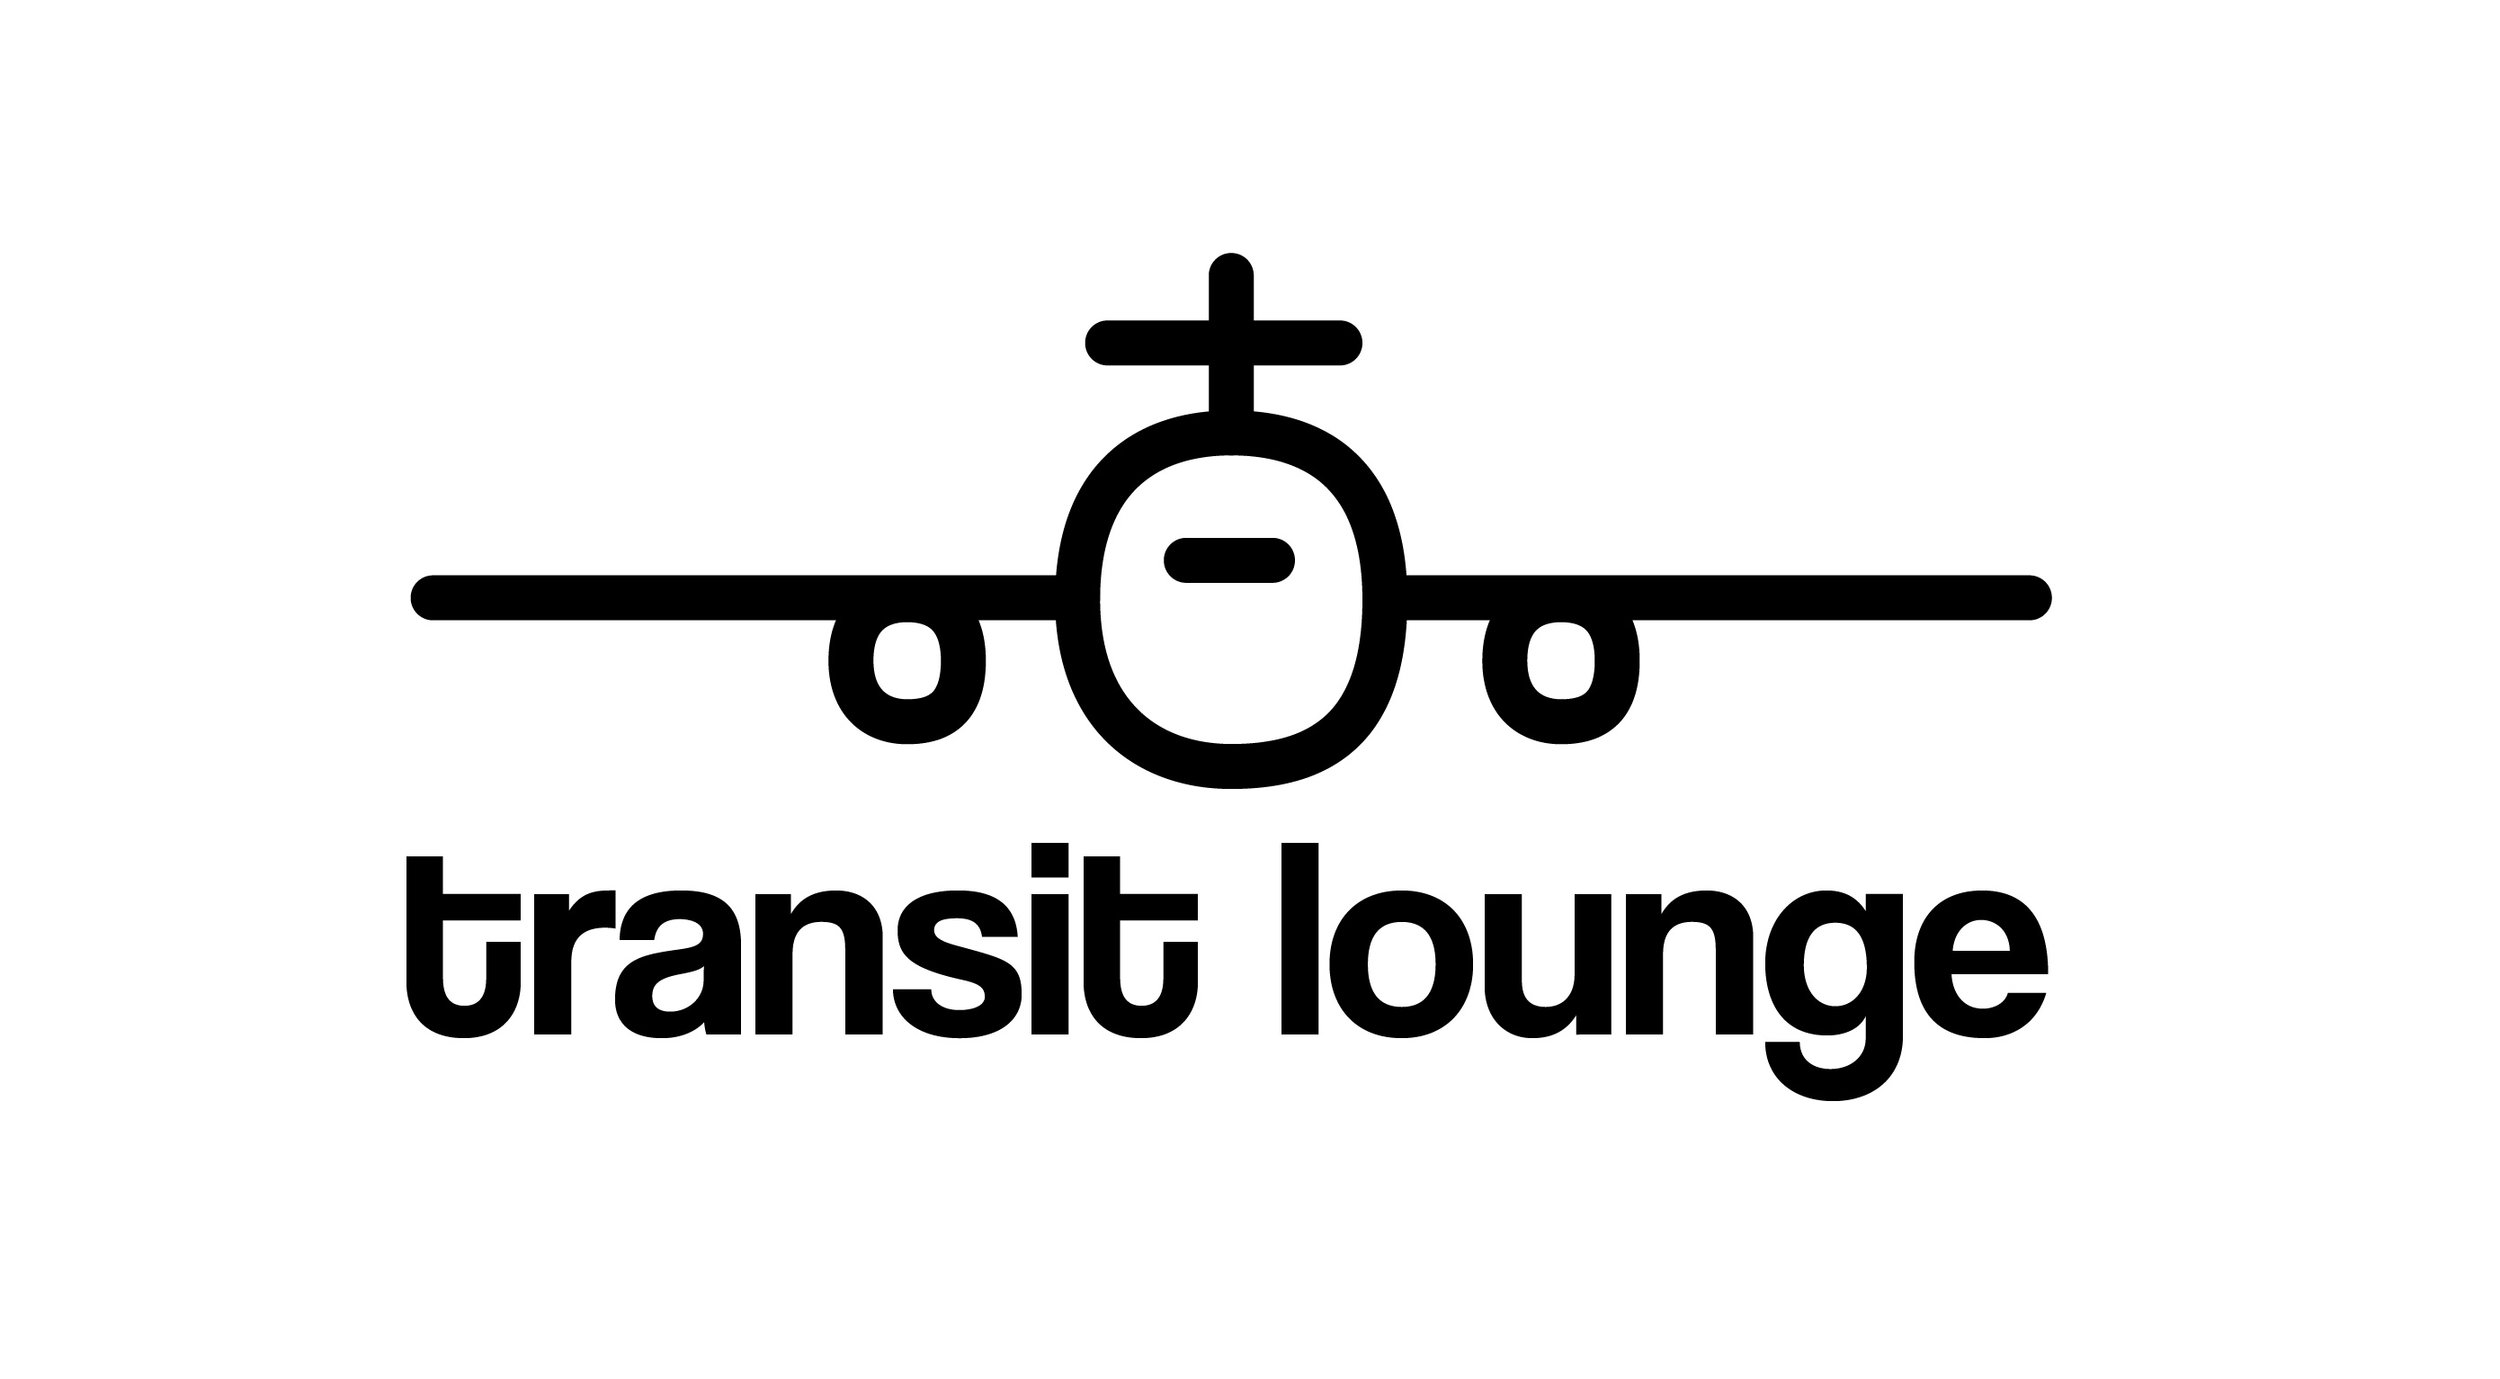 Hayley_TransitLounge_AlternativeIdentity-04.jpg